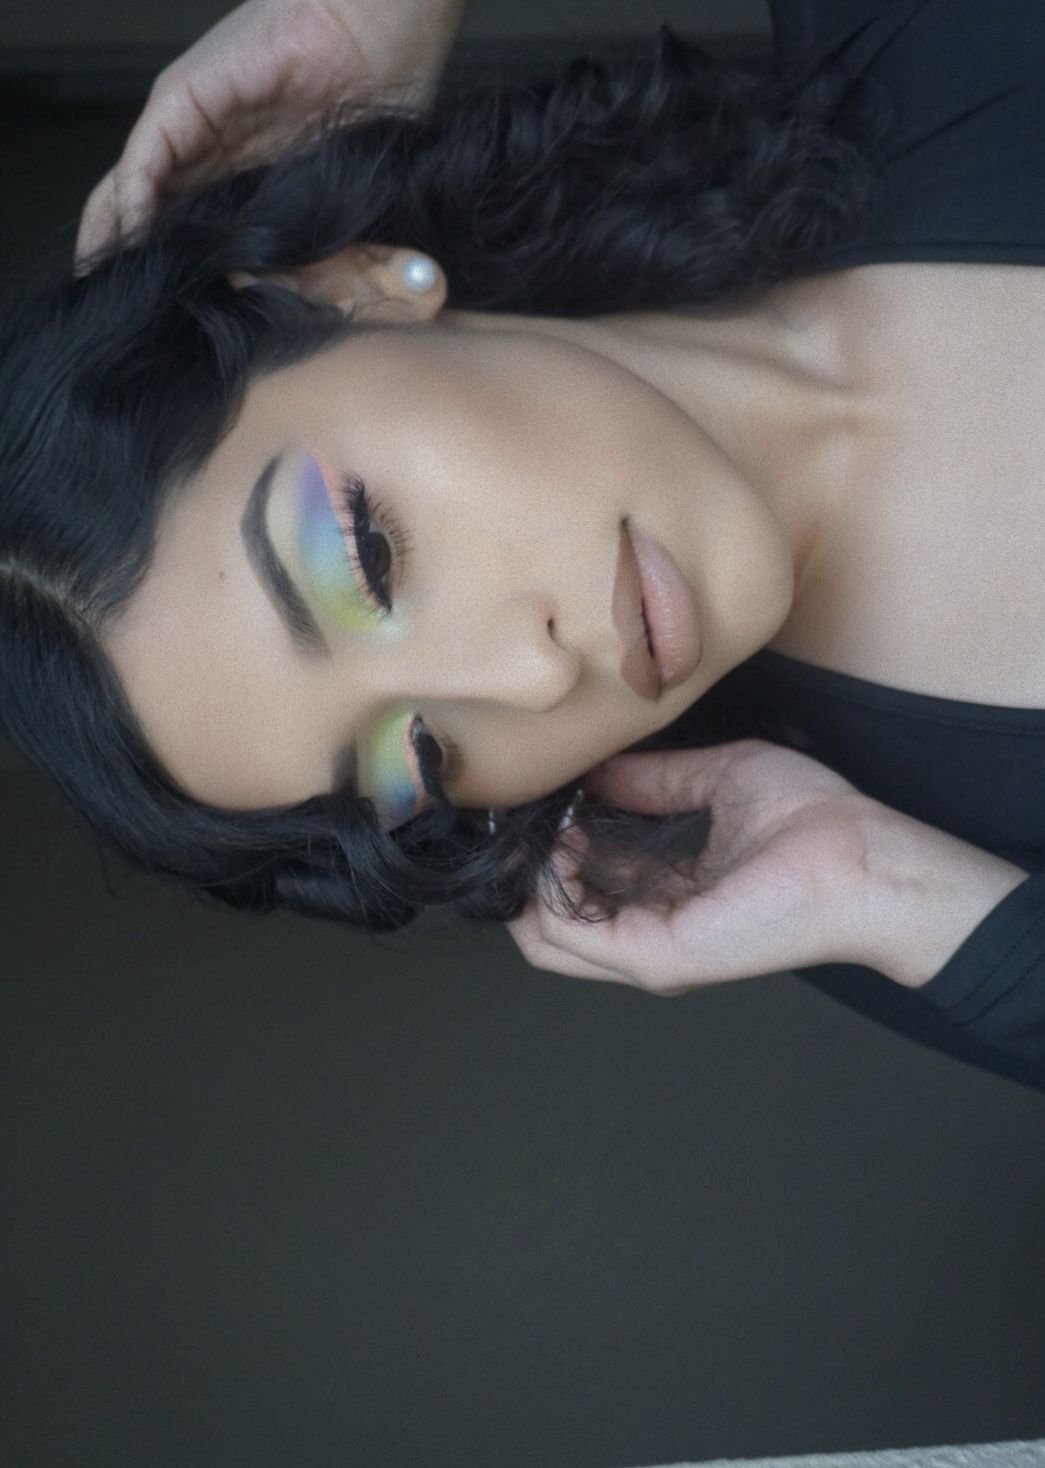 Morphe 35i icy fantasy pastel makeup look in 2020 Makeup